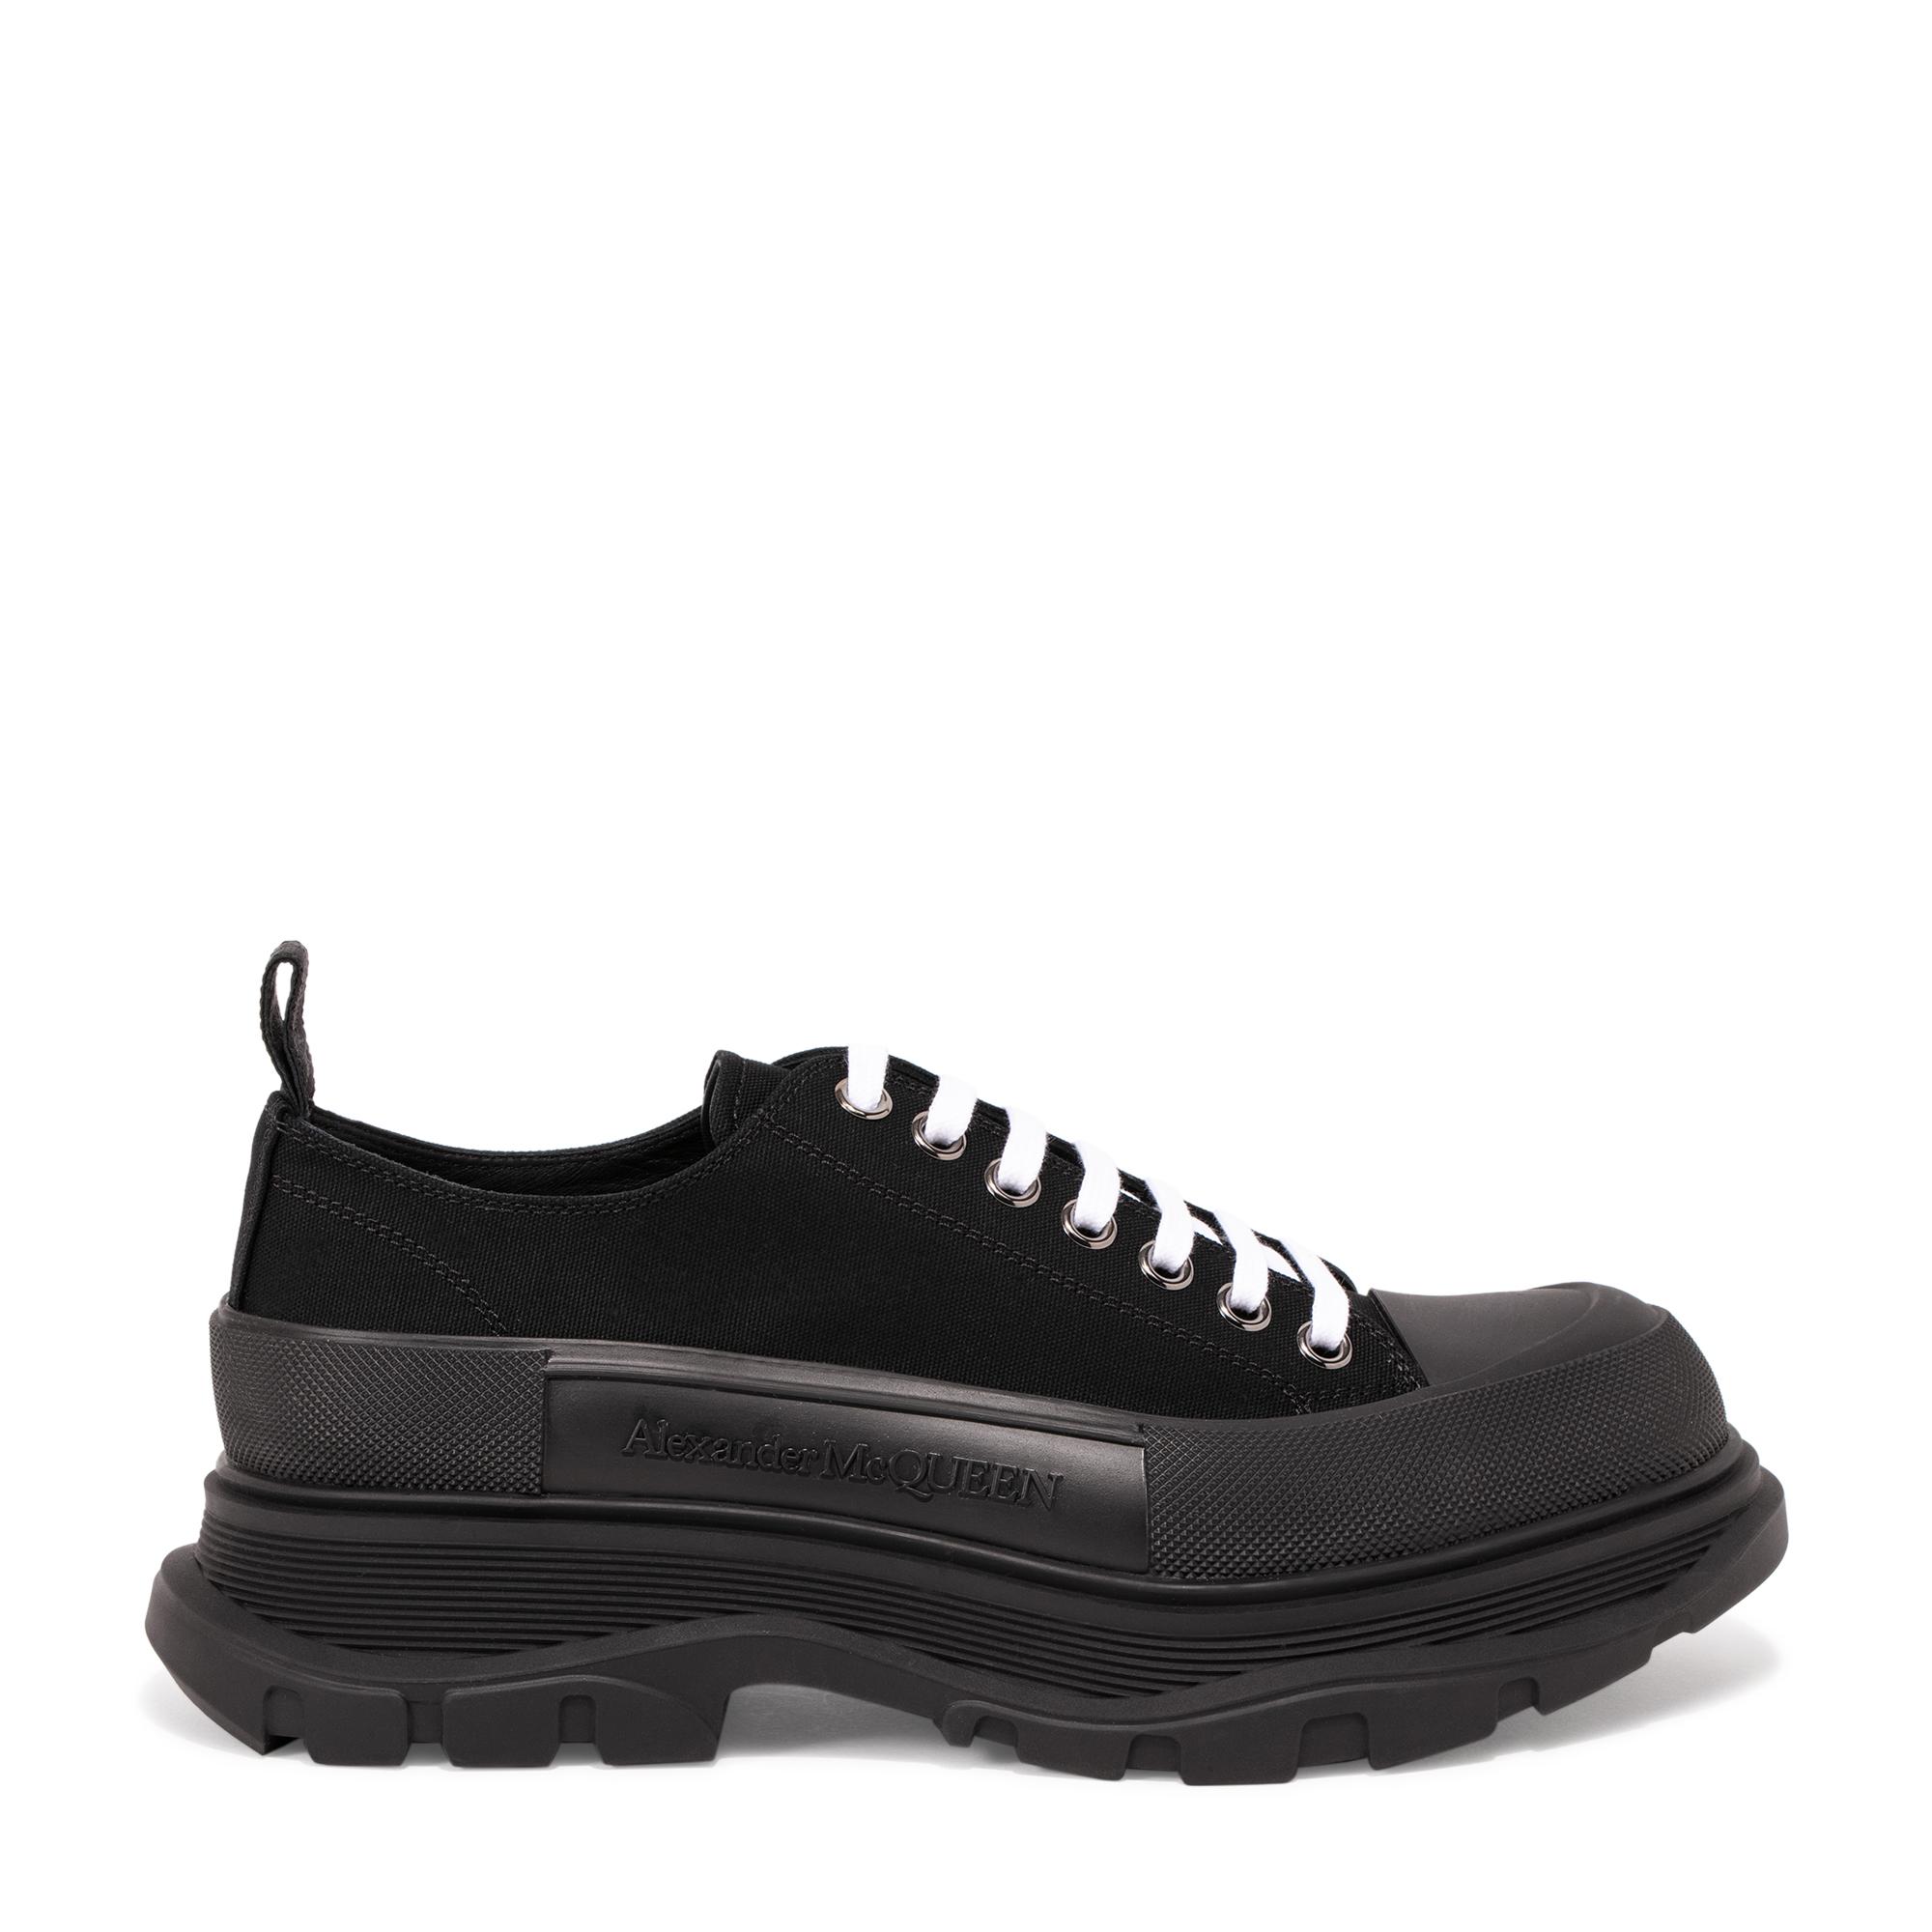 Tread sneakers